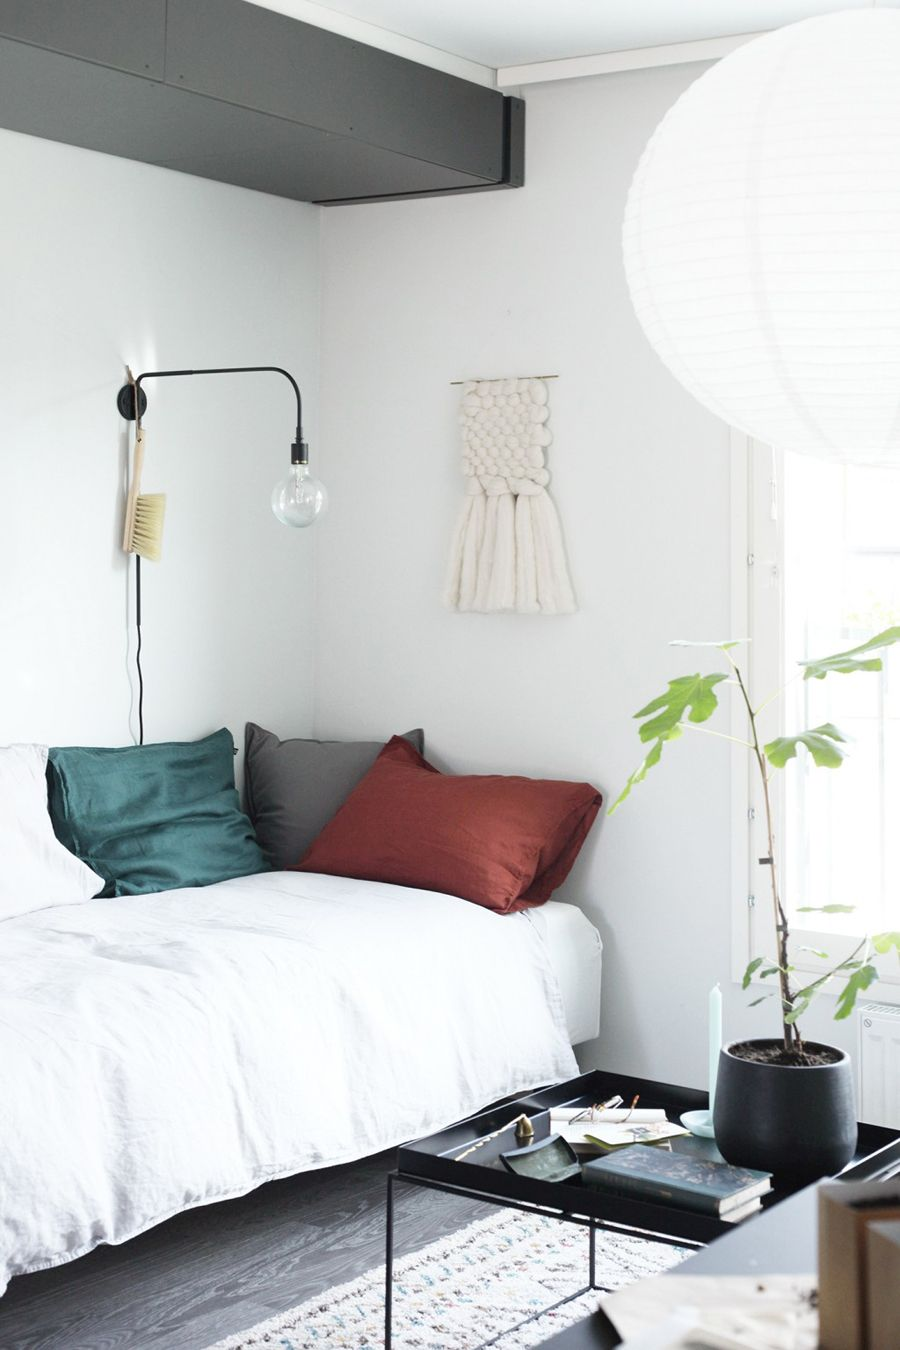 Susanna vento yit smartti bedrooms and interiors